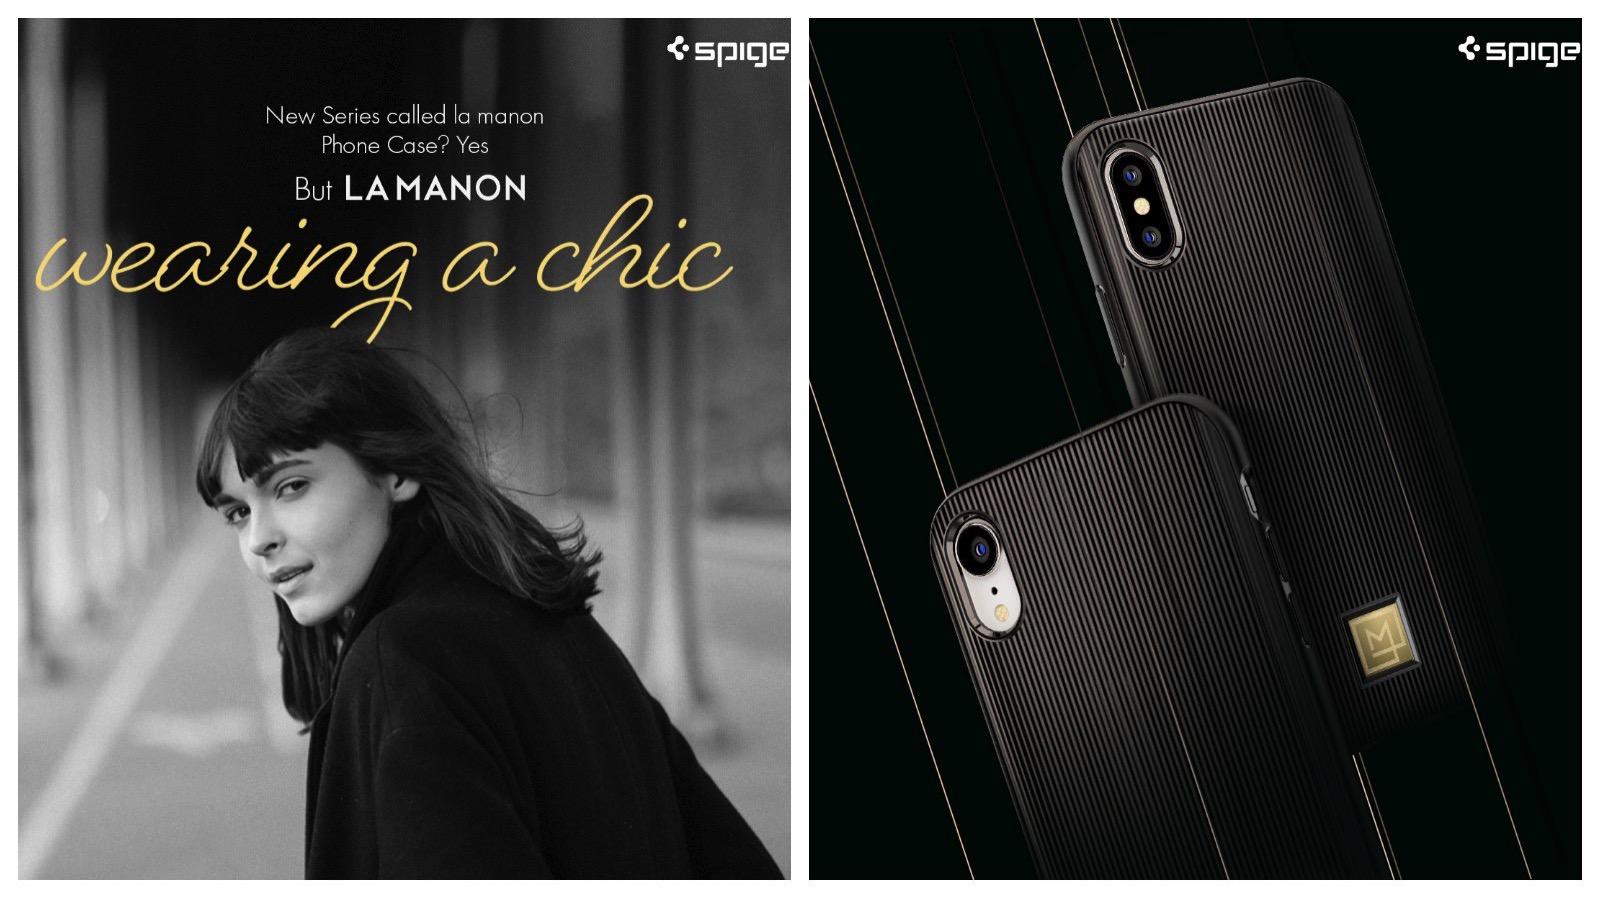 La Monon Spigen new brand